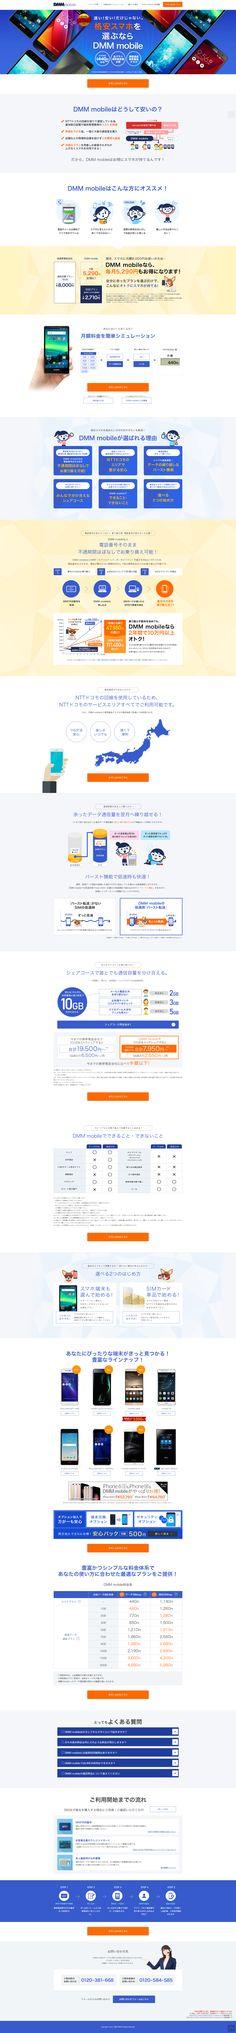 DMM mobile   DMM.com